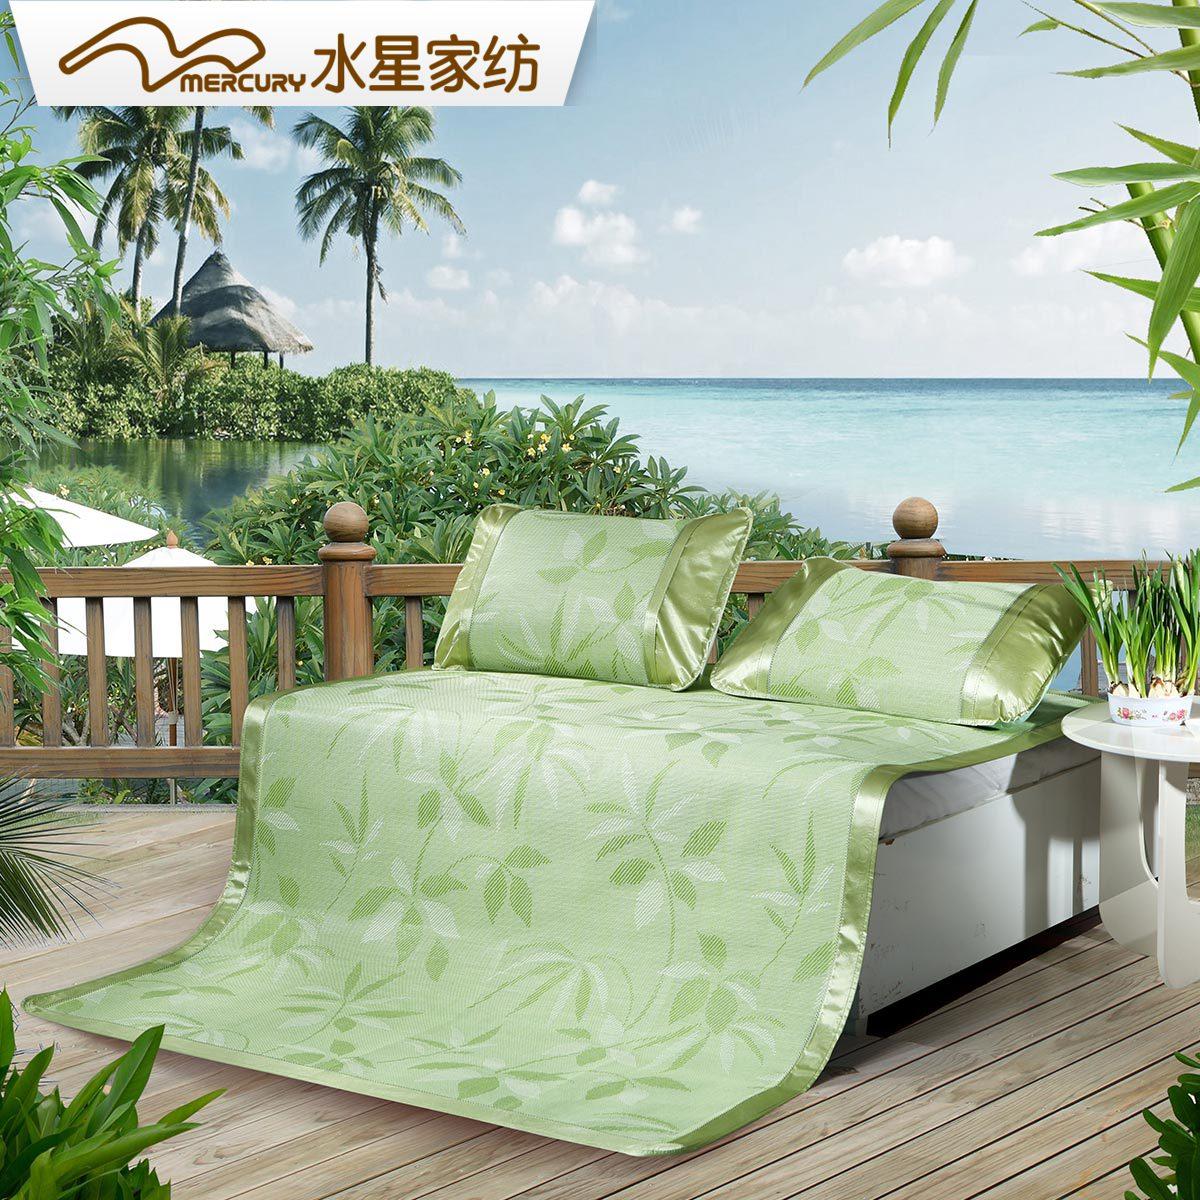 Декоративные одеяла и подушки / Прикроватные коврики Артикул 545197198922